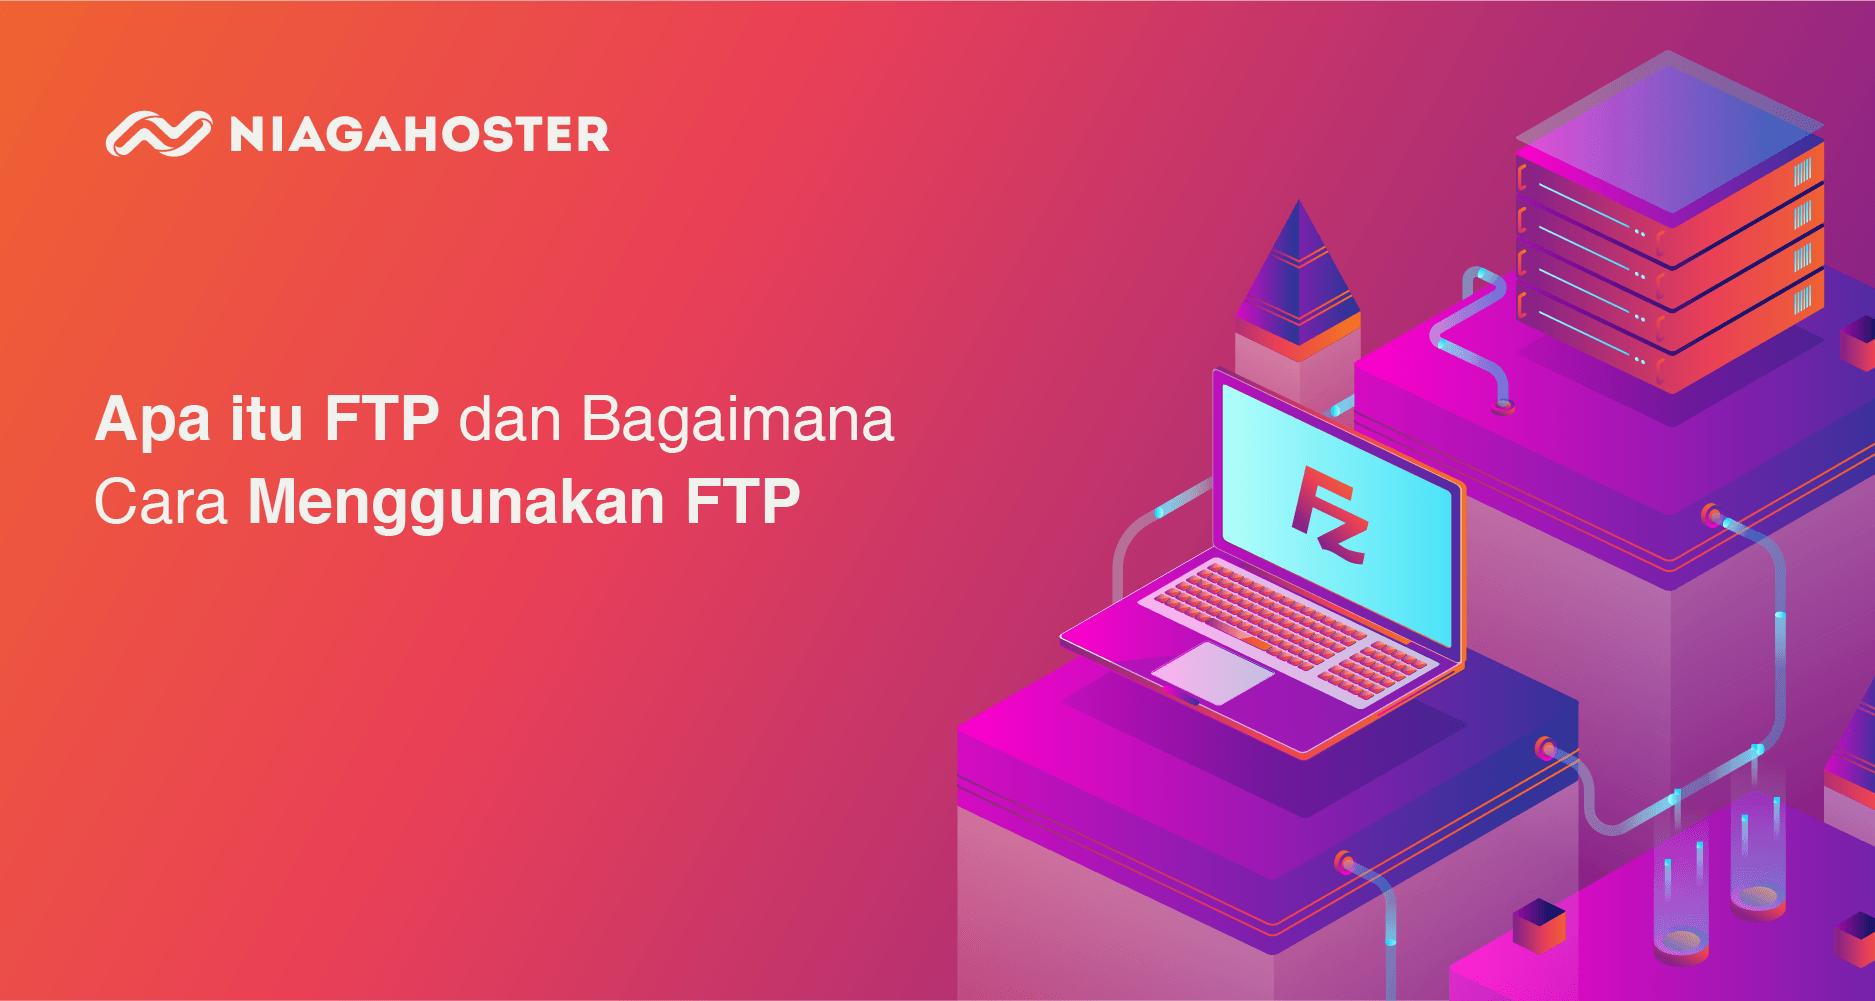 Apa itu FTP dan Bagaimana Cara Menggunakan FTP_blog